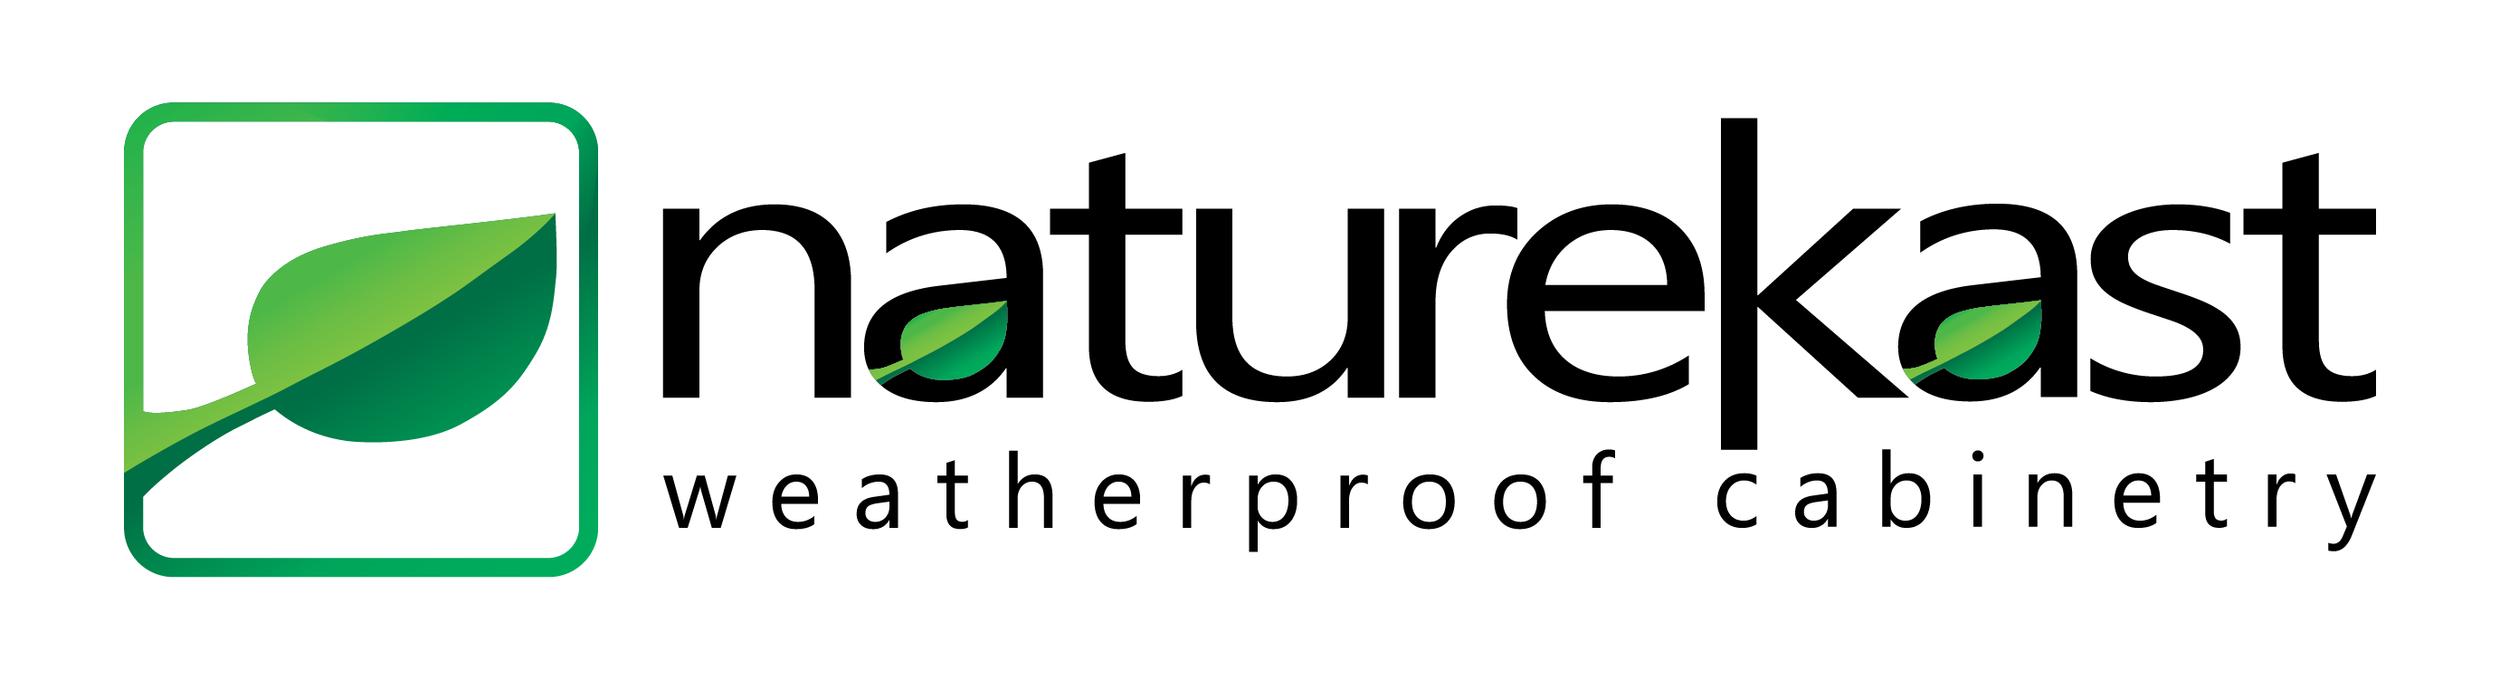 NatureKast-Logo2018 on white backgrounds.png